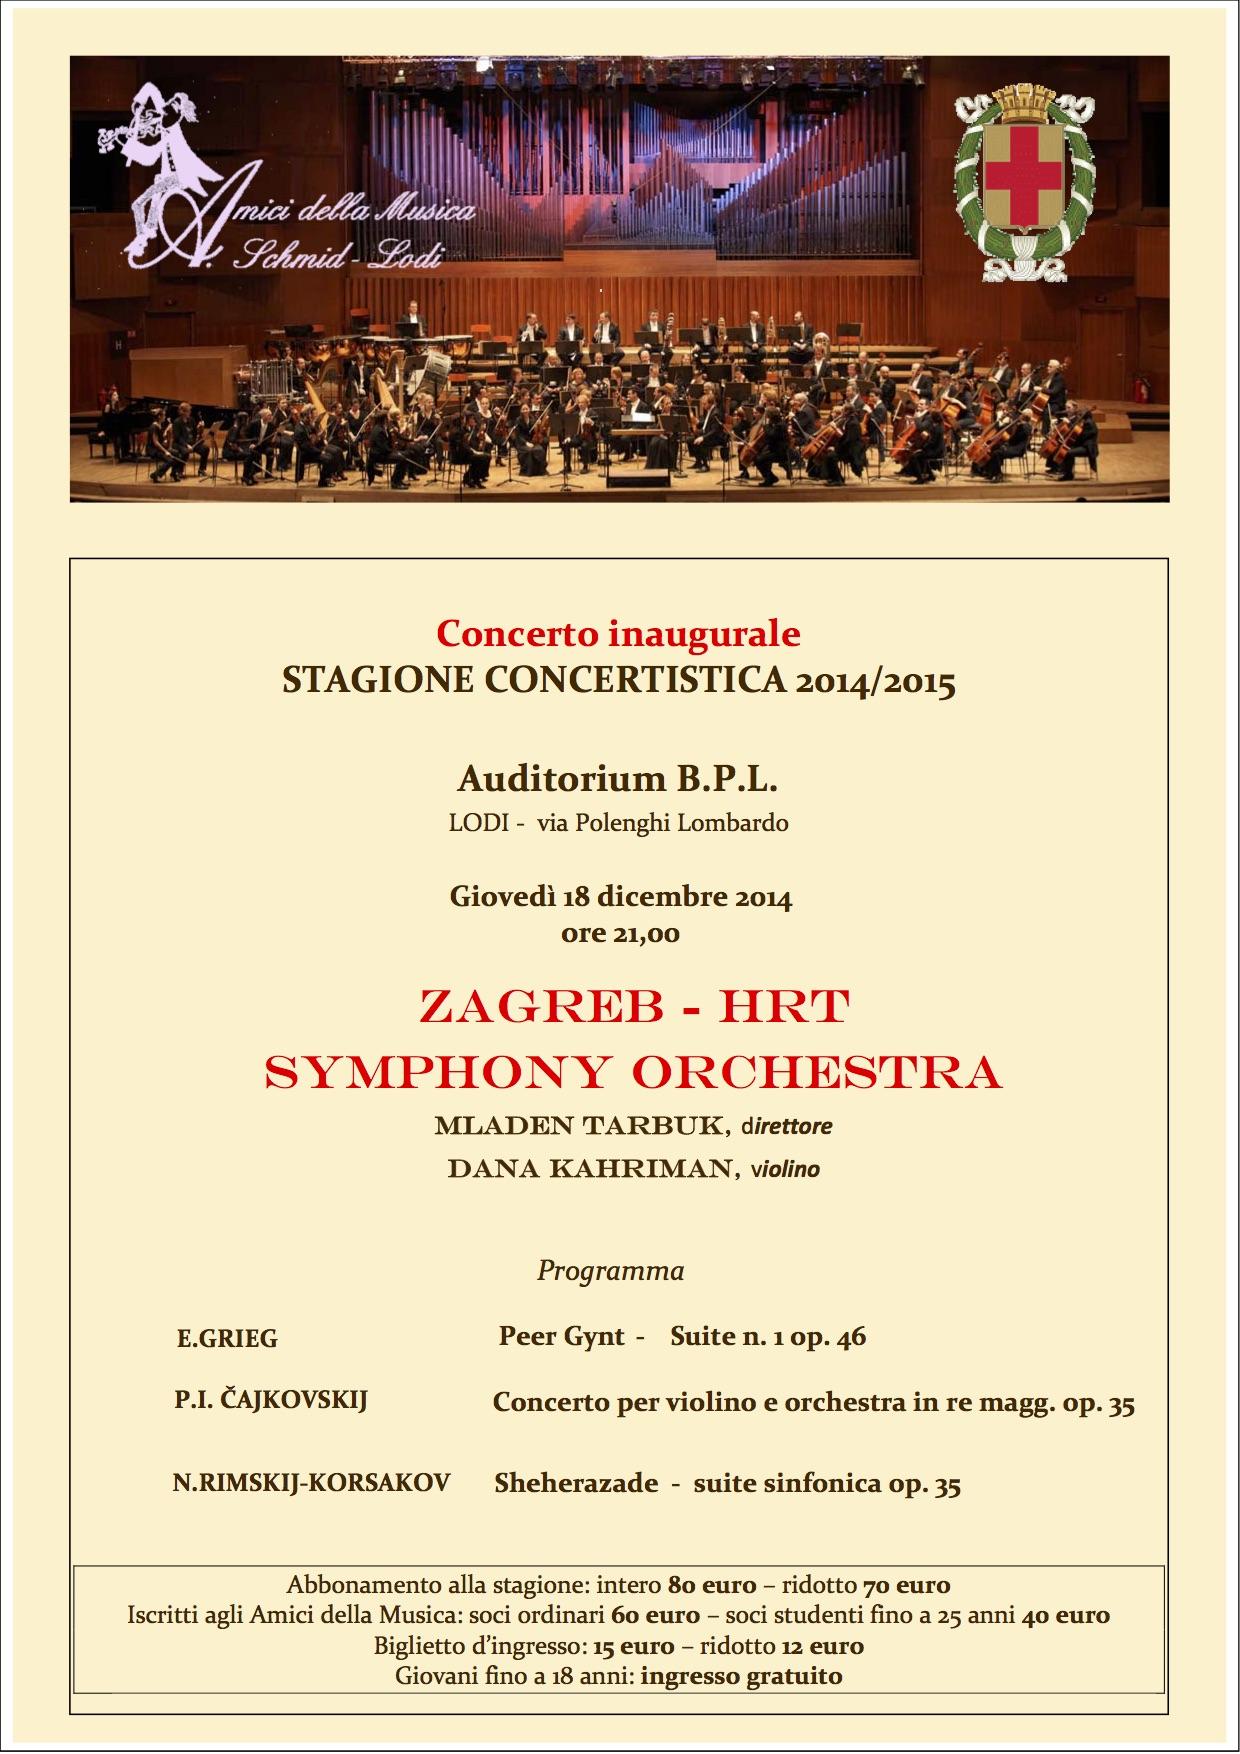 Concerto inaugurale Zagreb HRT Symphony Orchestra